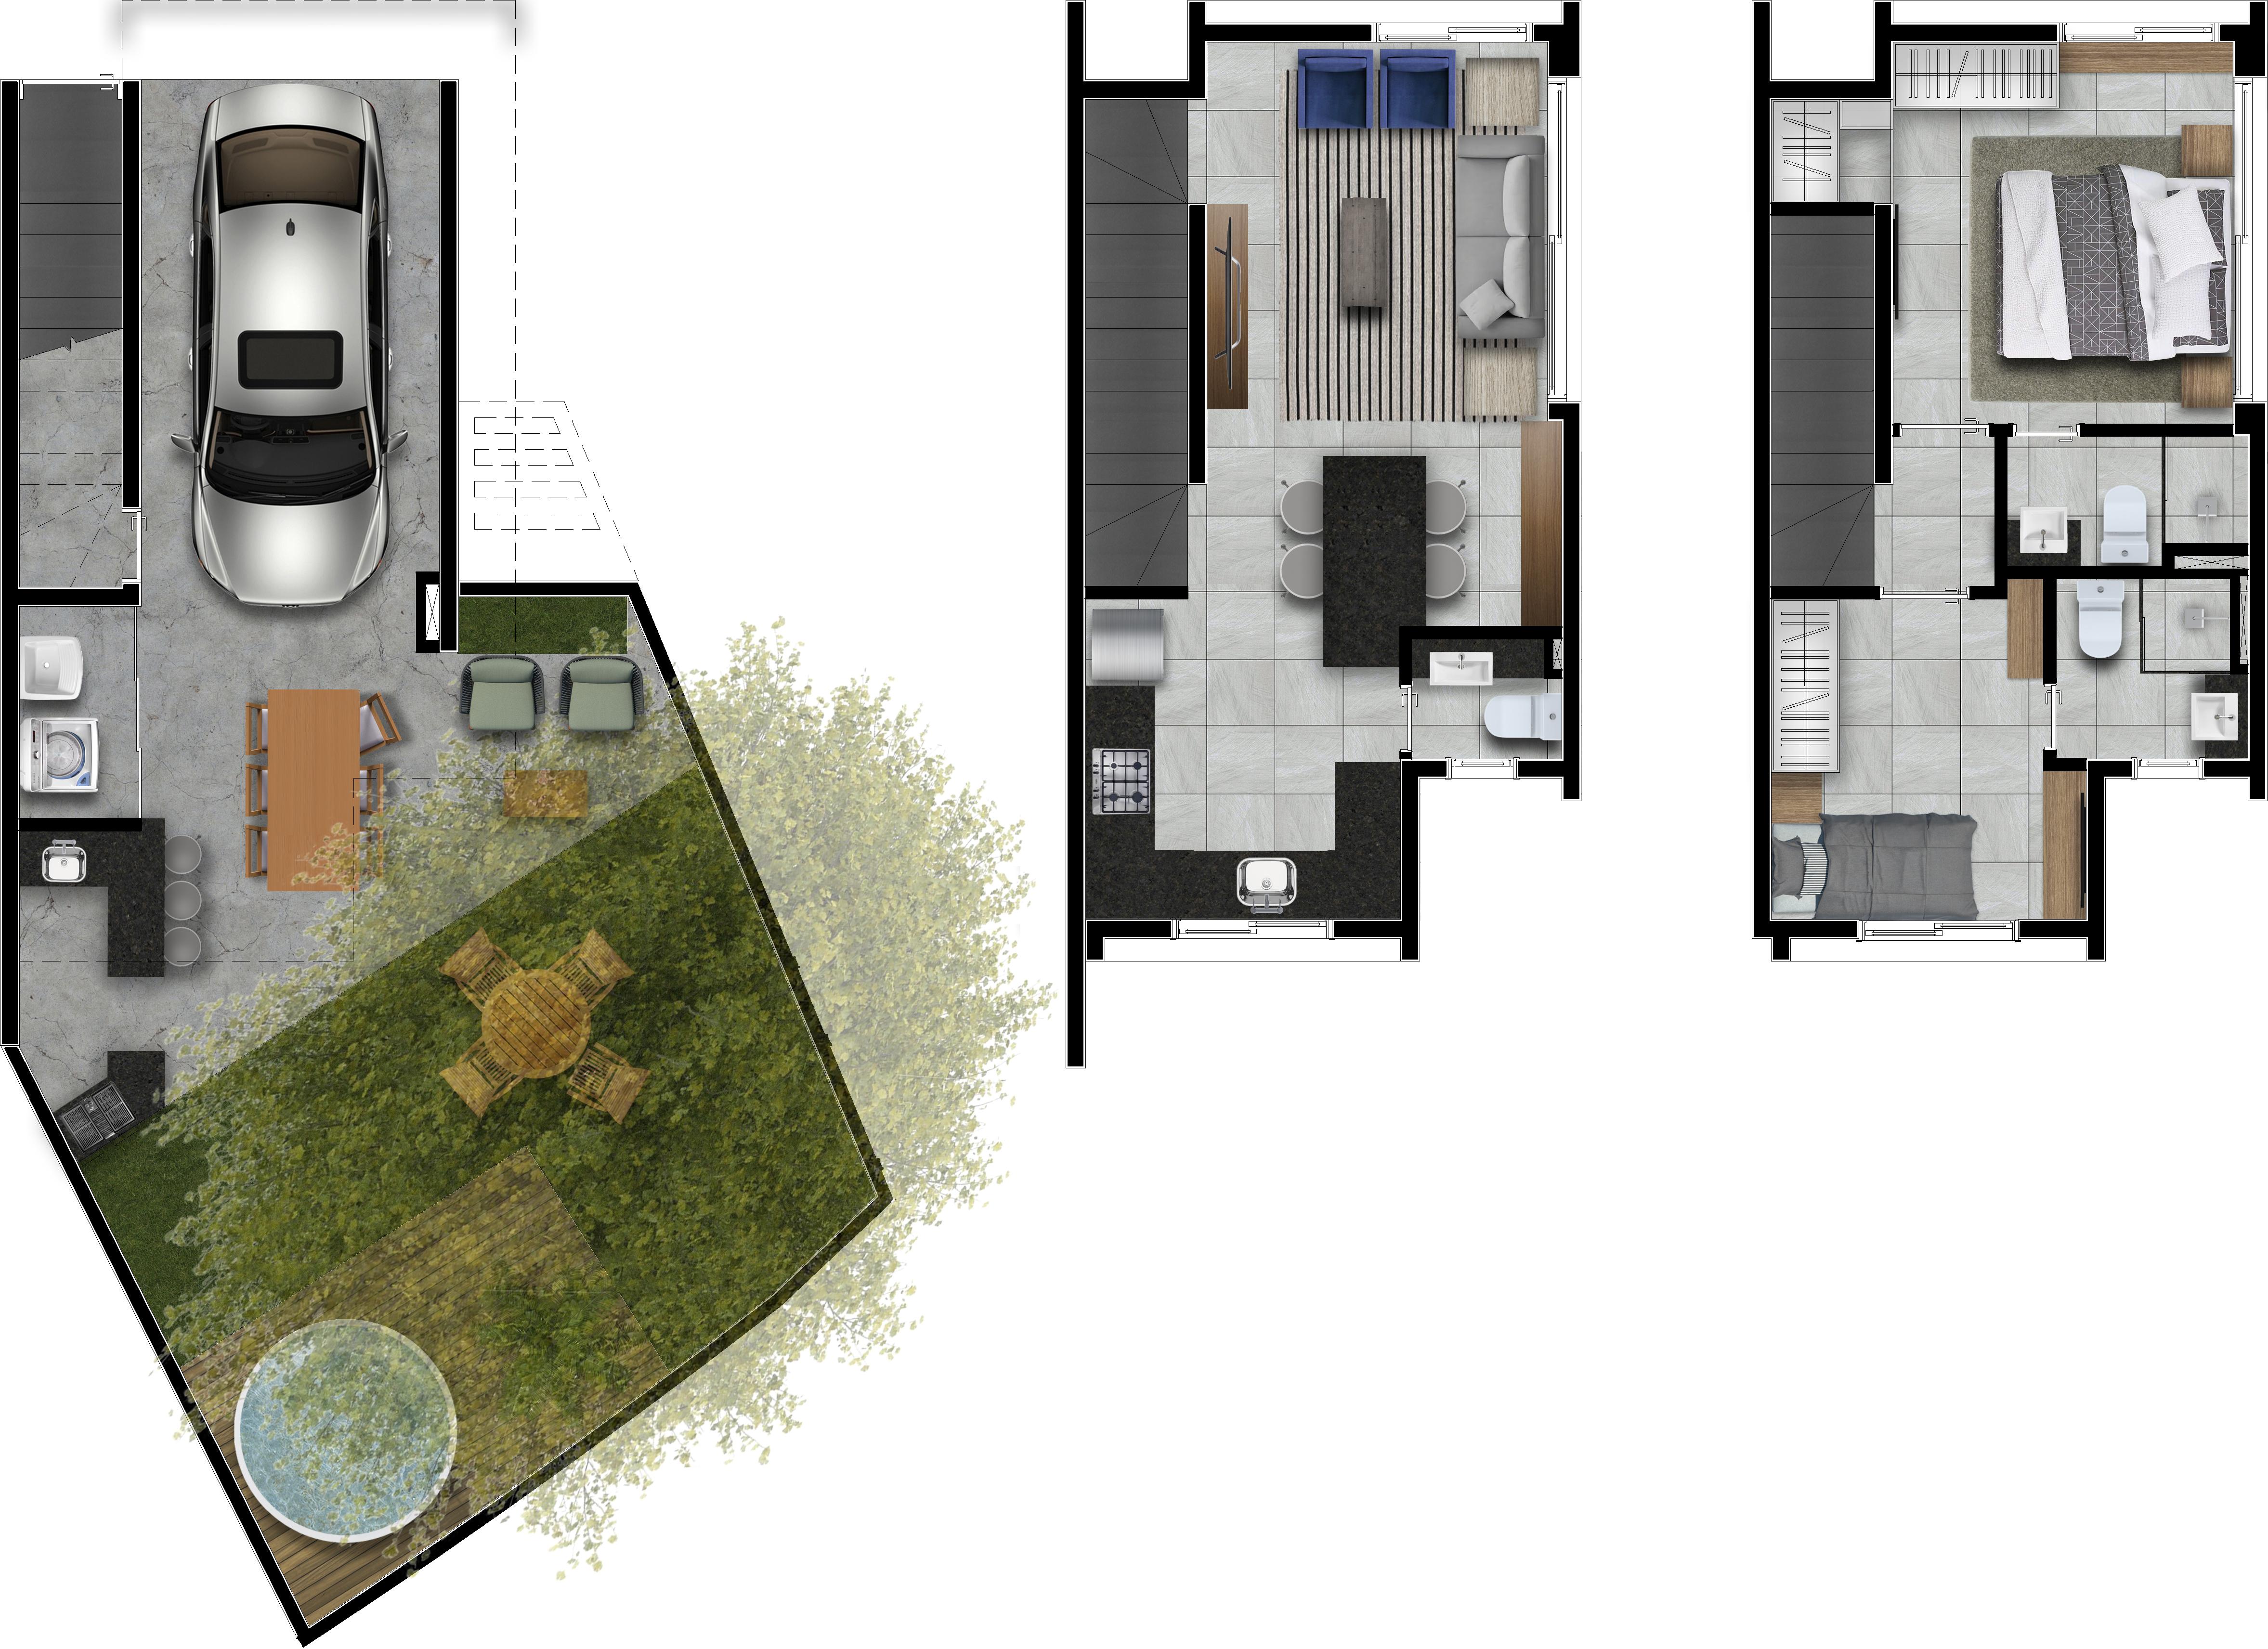 Casa 6 - 140m2